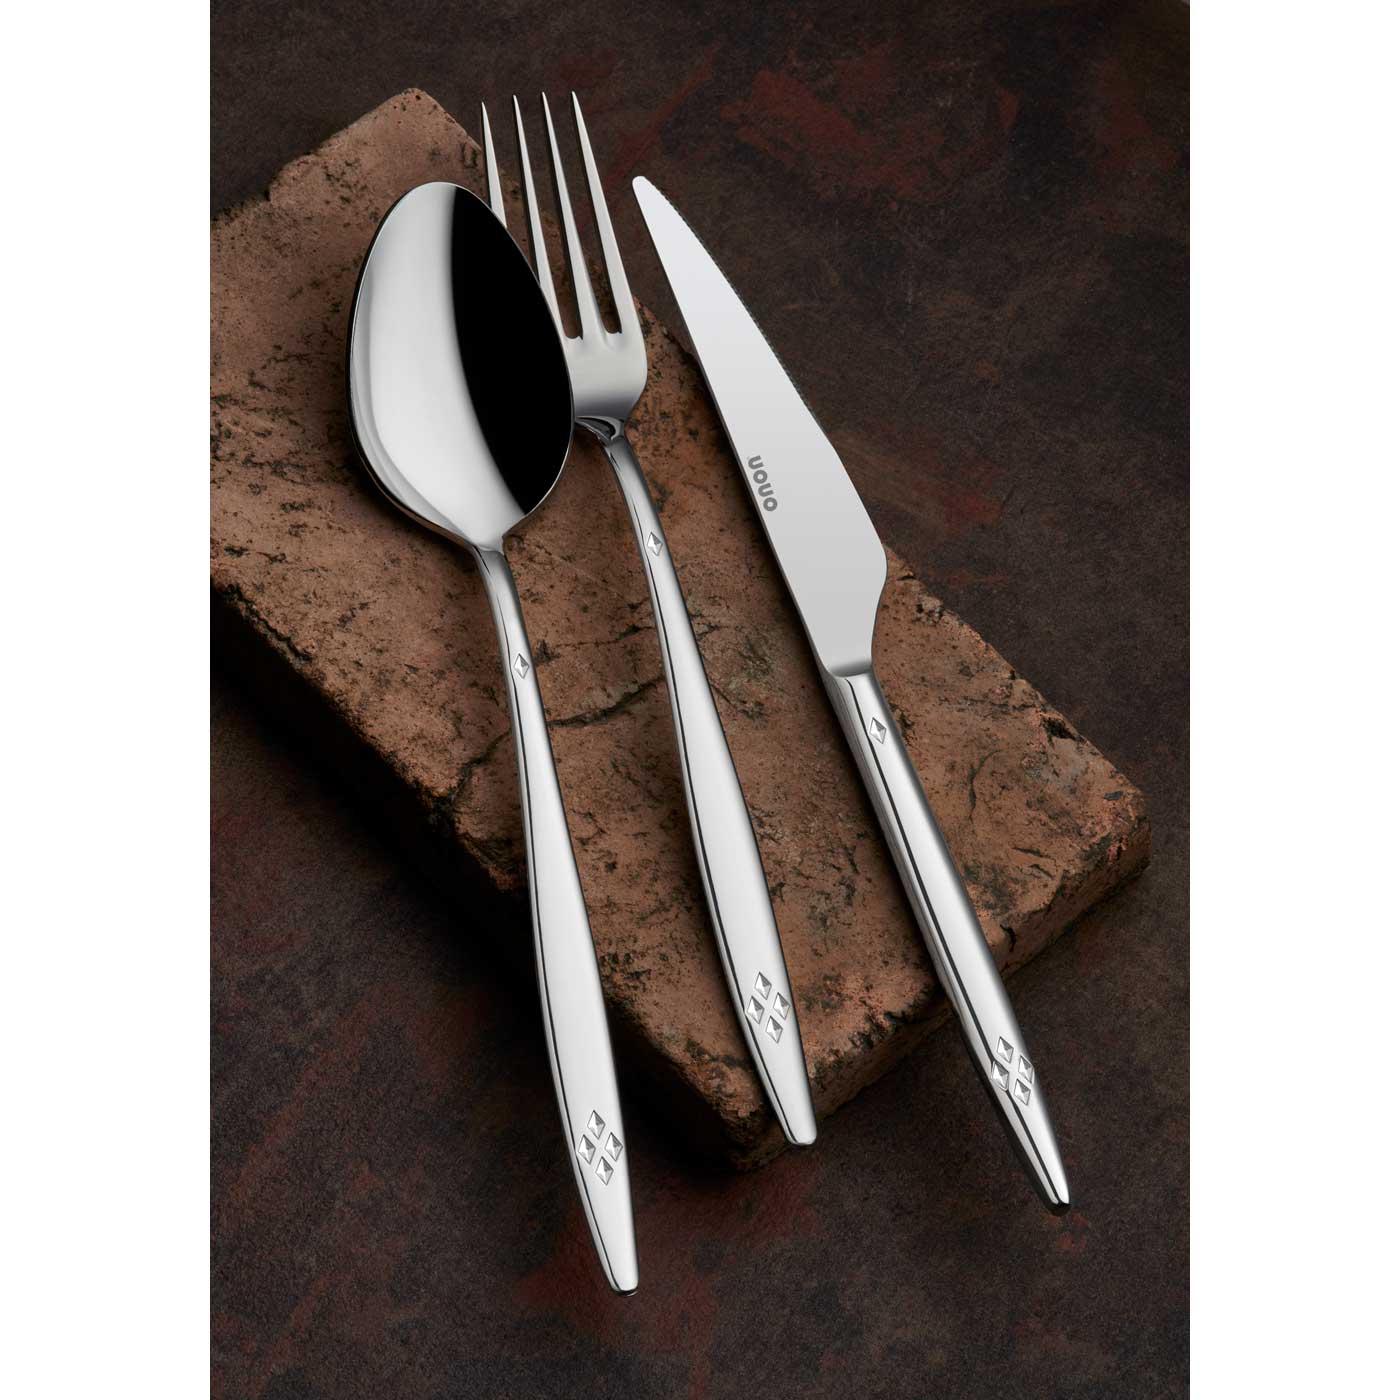 ONON Mira Sade 6 Adet Yemek Kaşığı 2